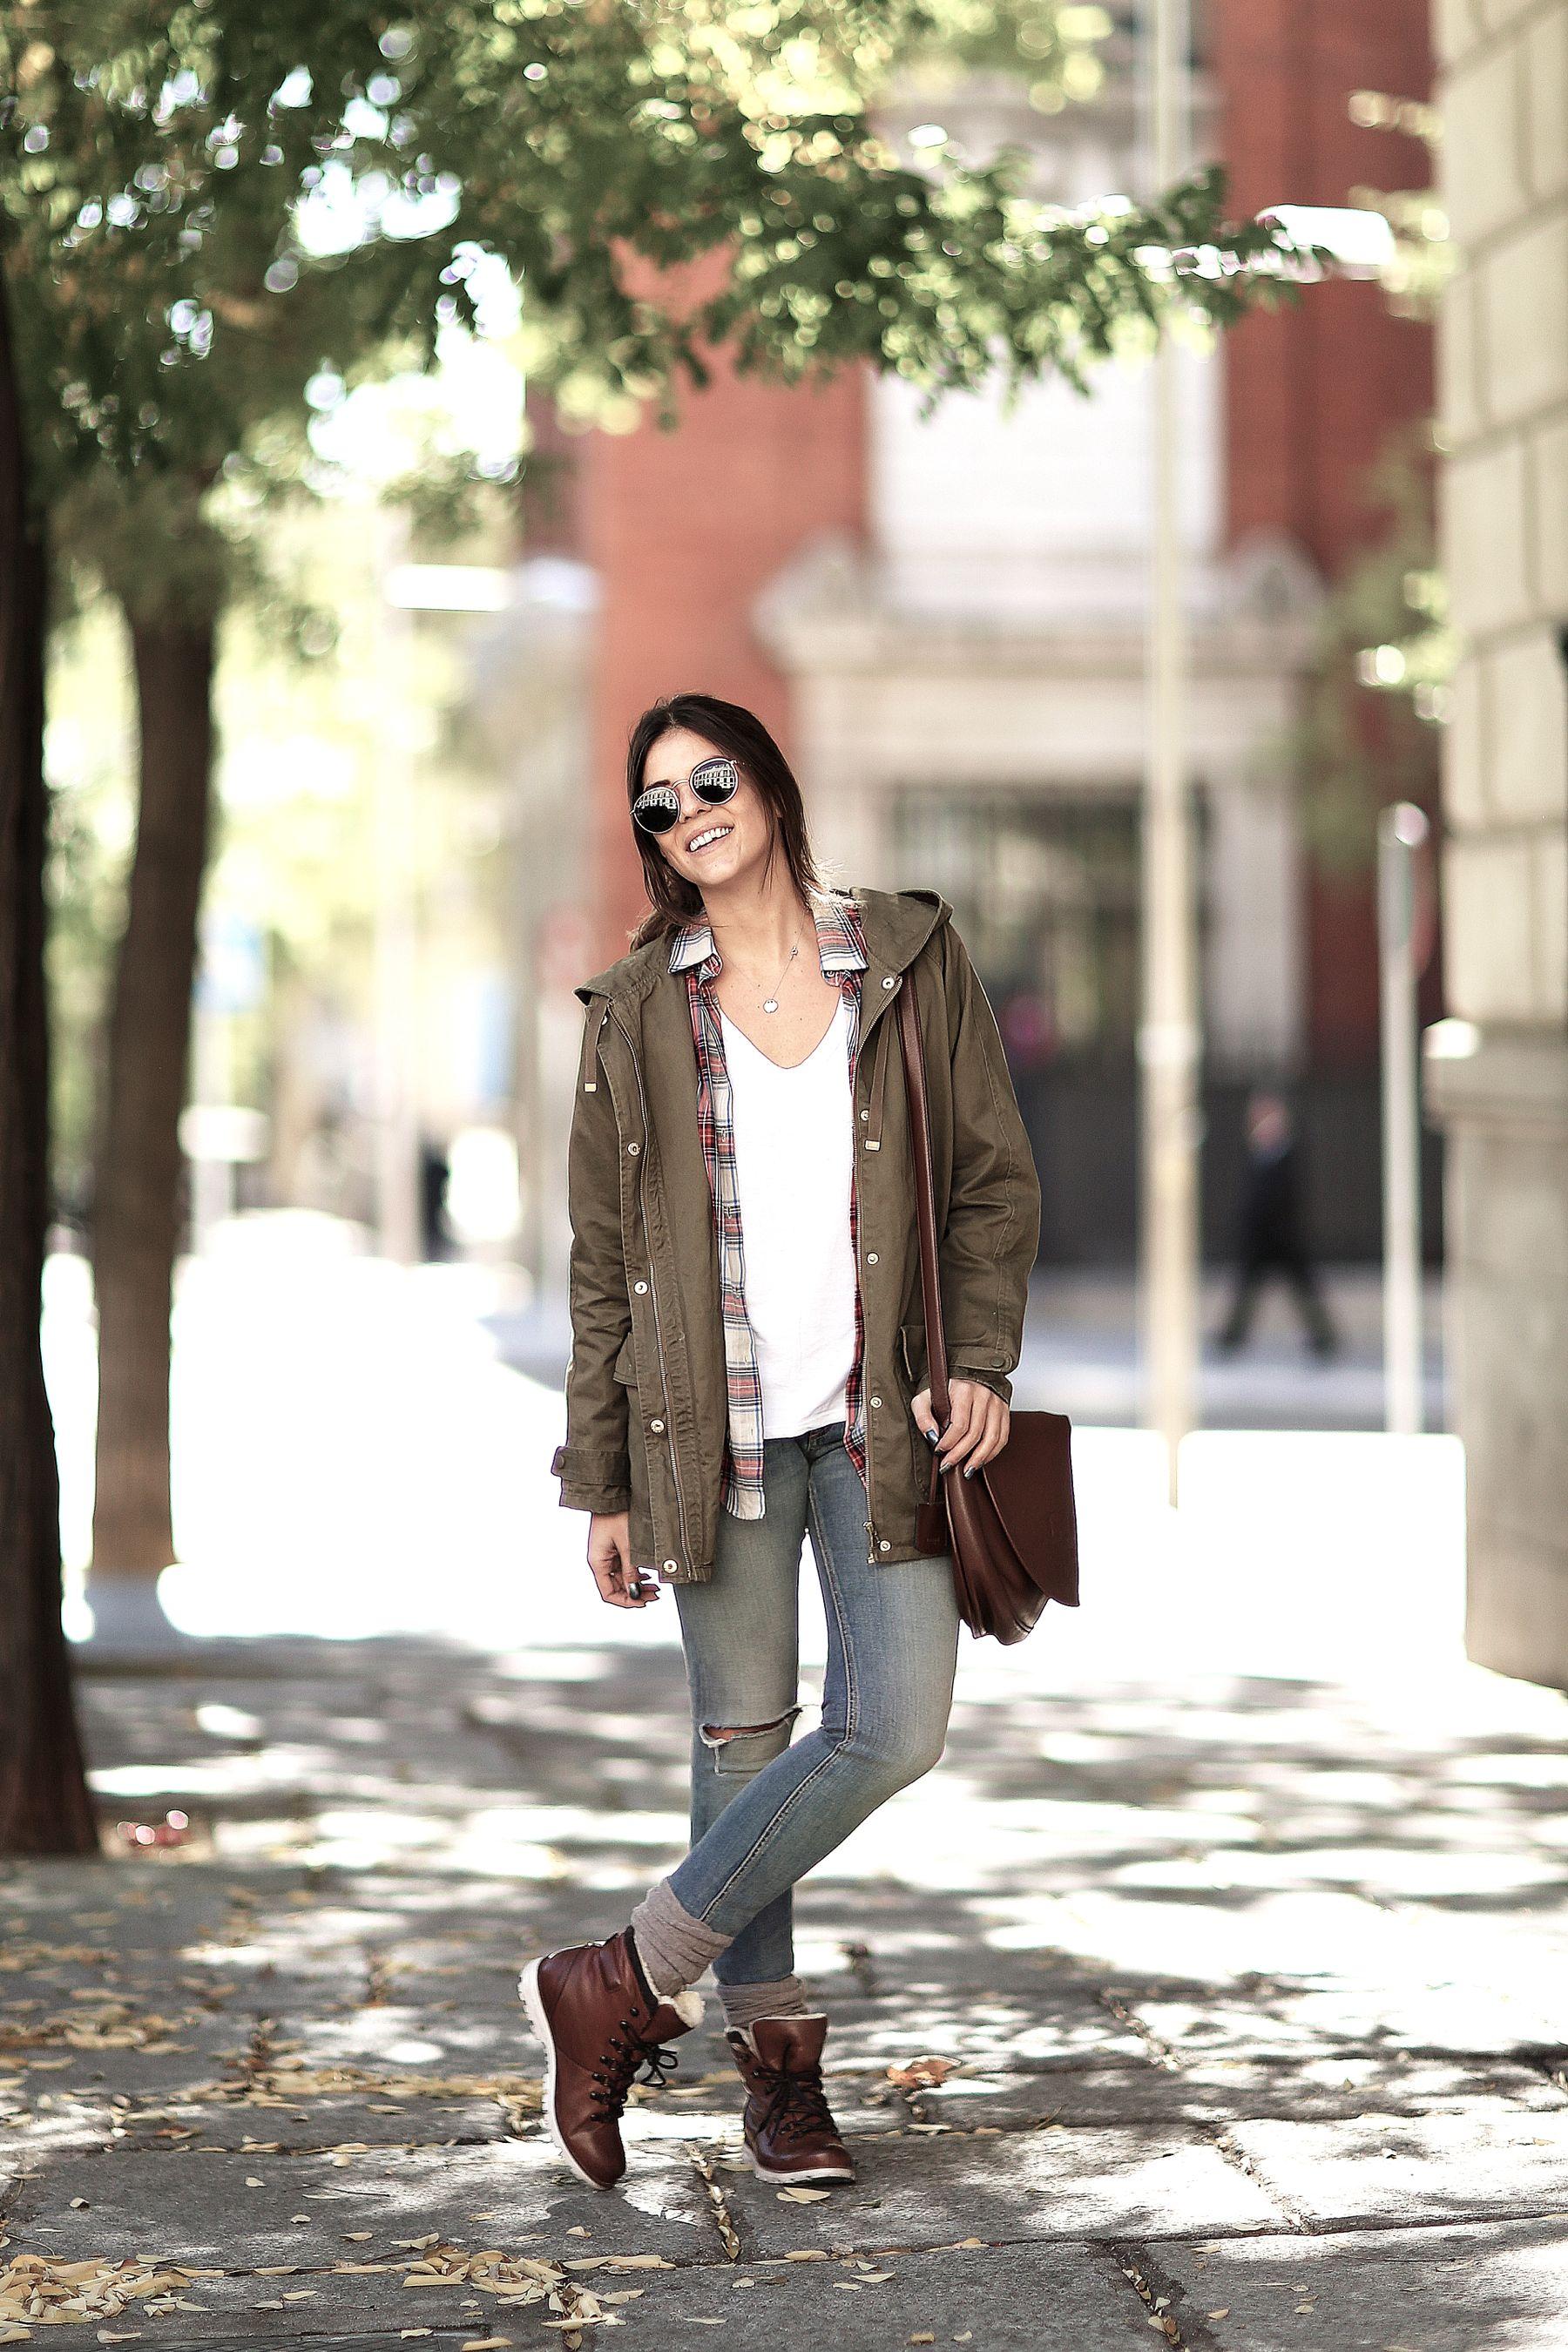 trendy-taste-look-outfit-street-style-trekking-tendencia-botas-parka-camisa-cuadros-plaid-shirt-fall-otoño-9